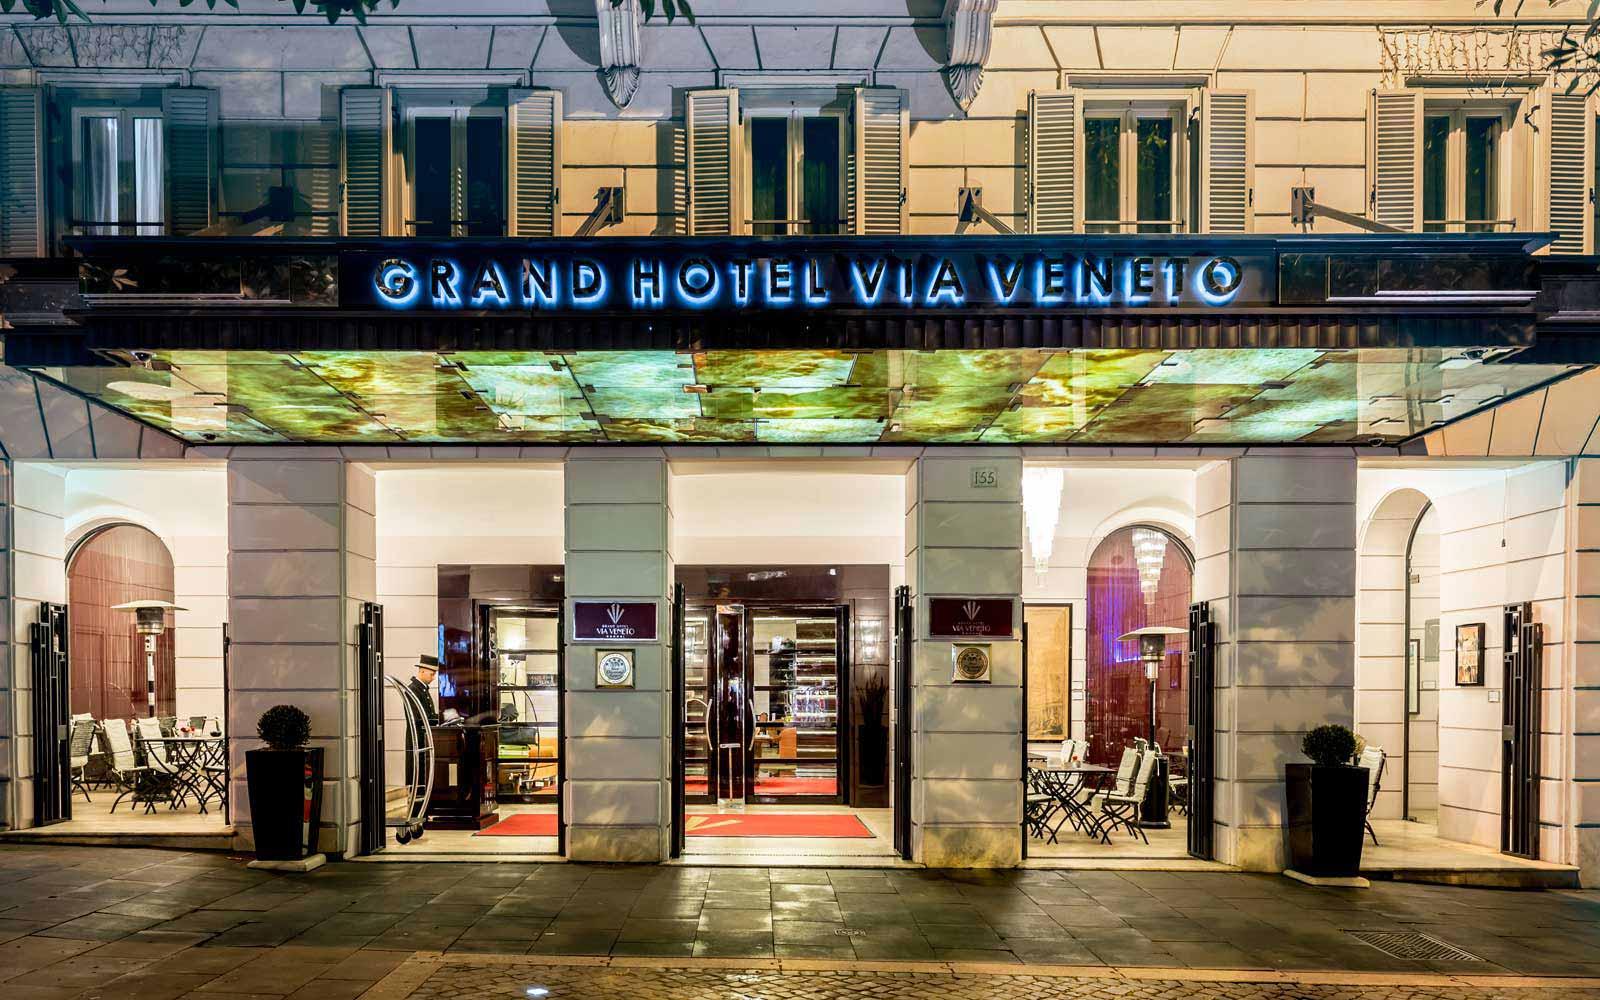 Entrance at the Grand Hotel Via Veneto